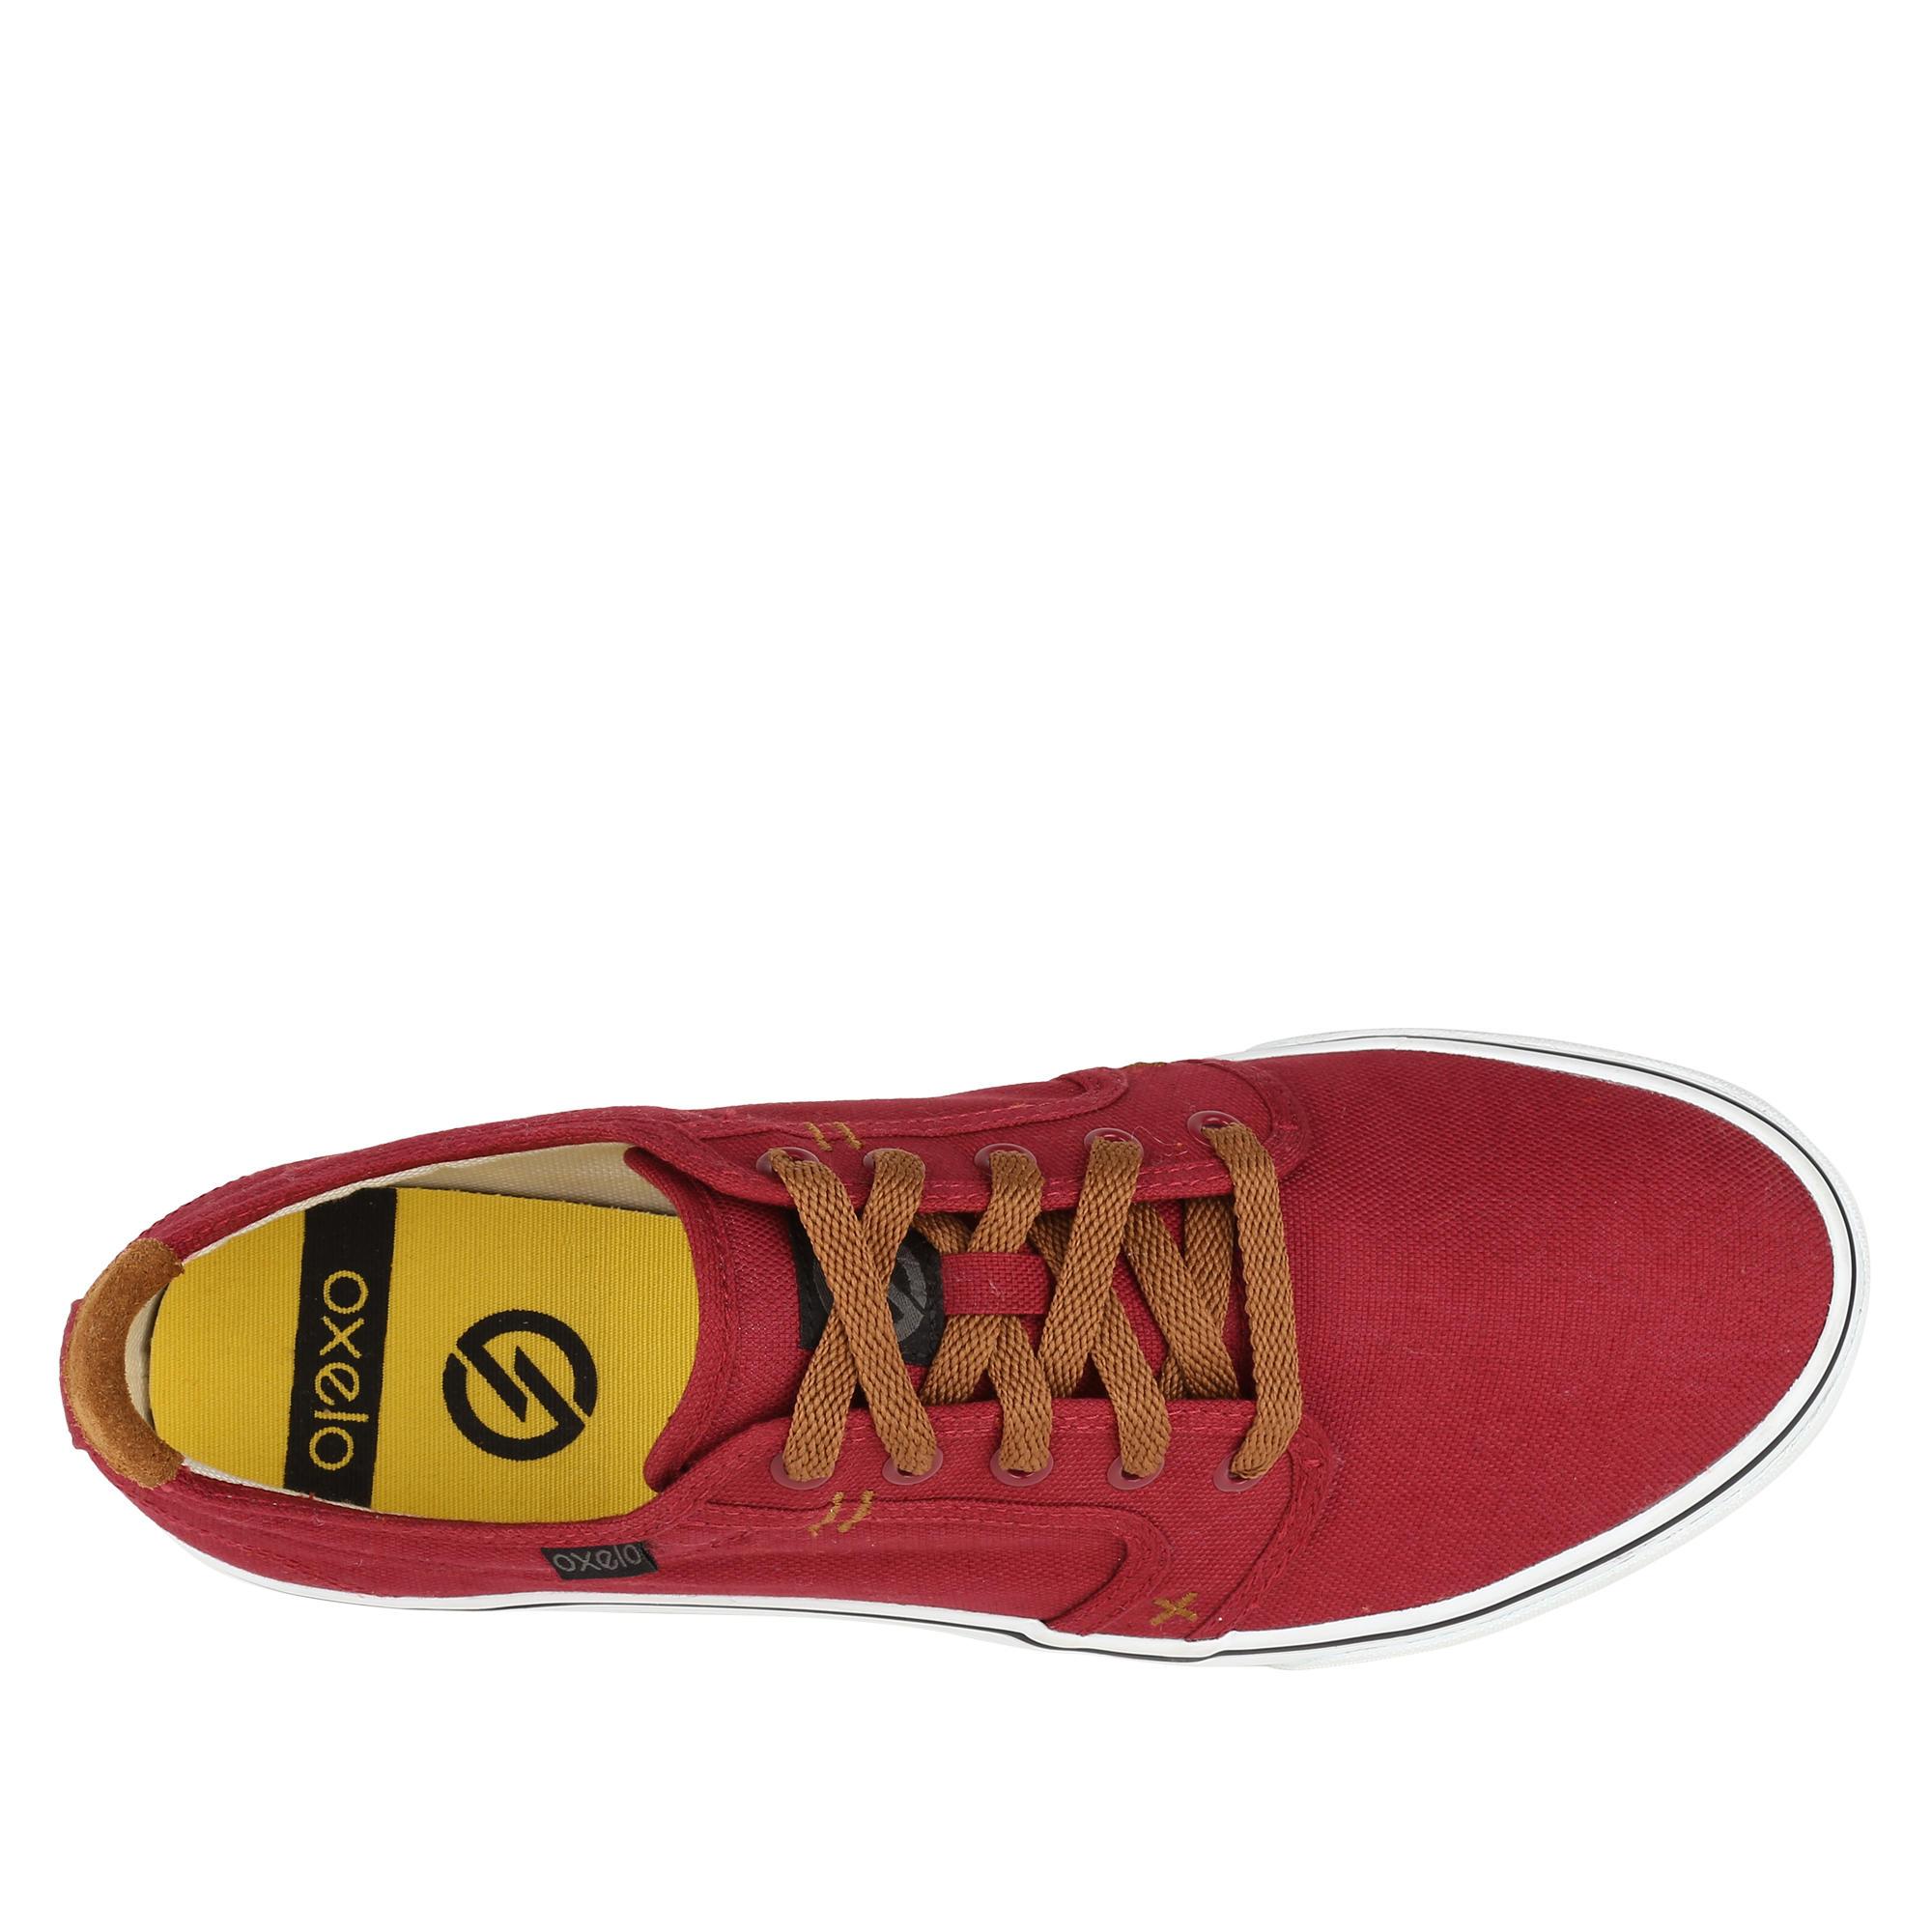 SKATEBOARD SHOES SKATE PLAY TIBET RED